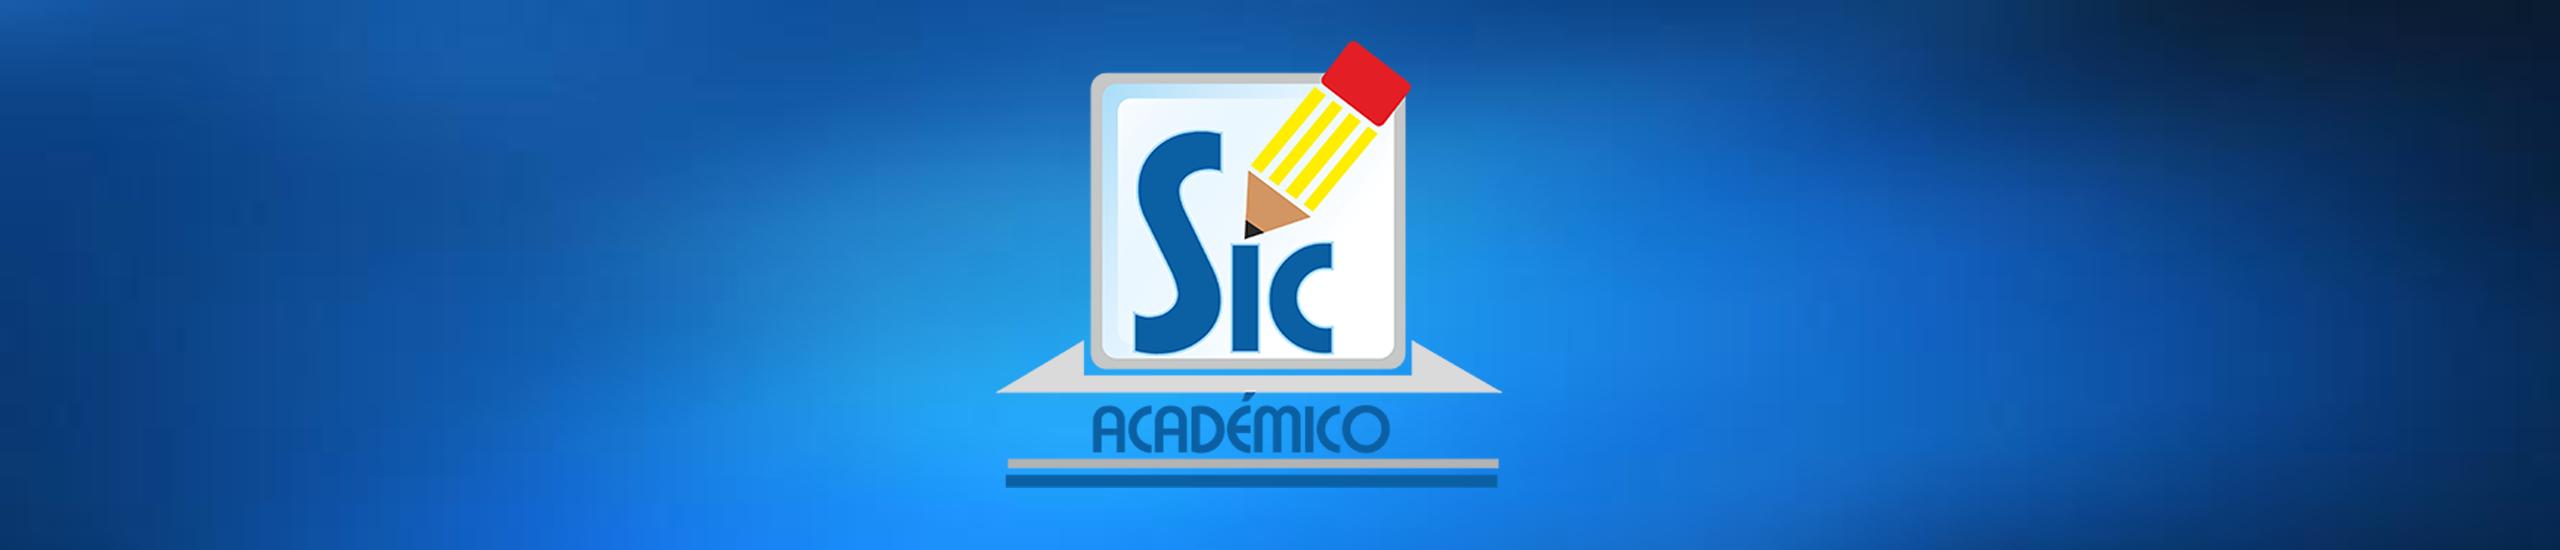 Sic Académico